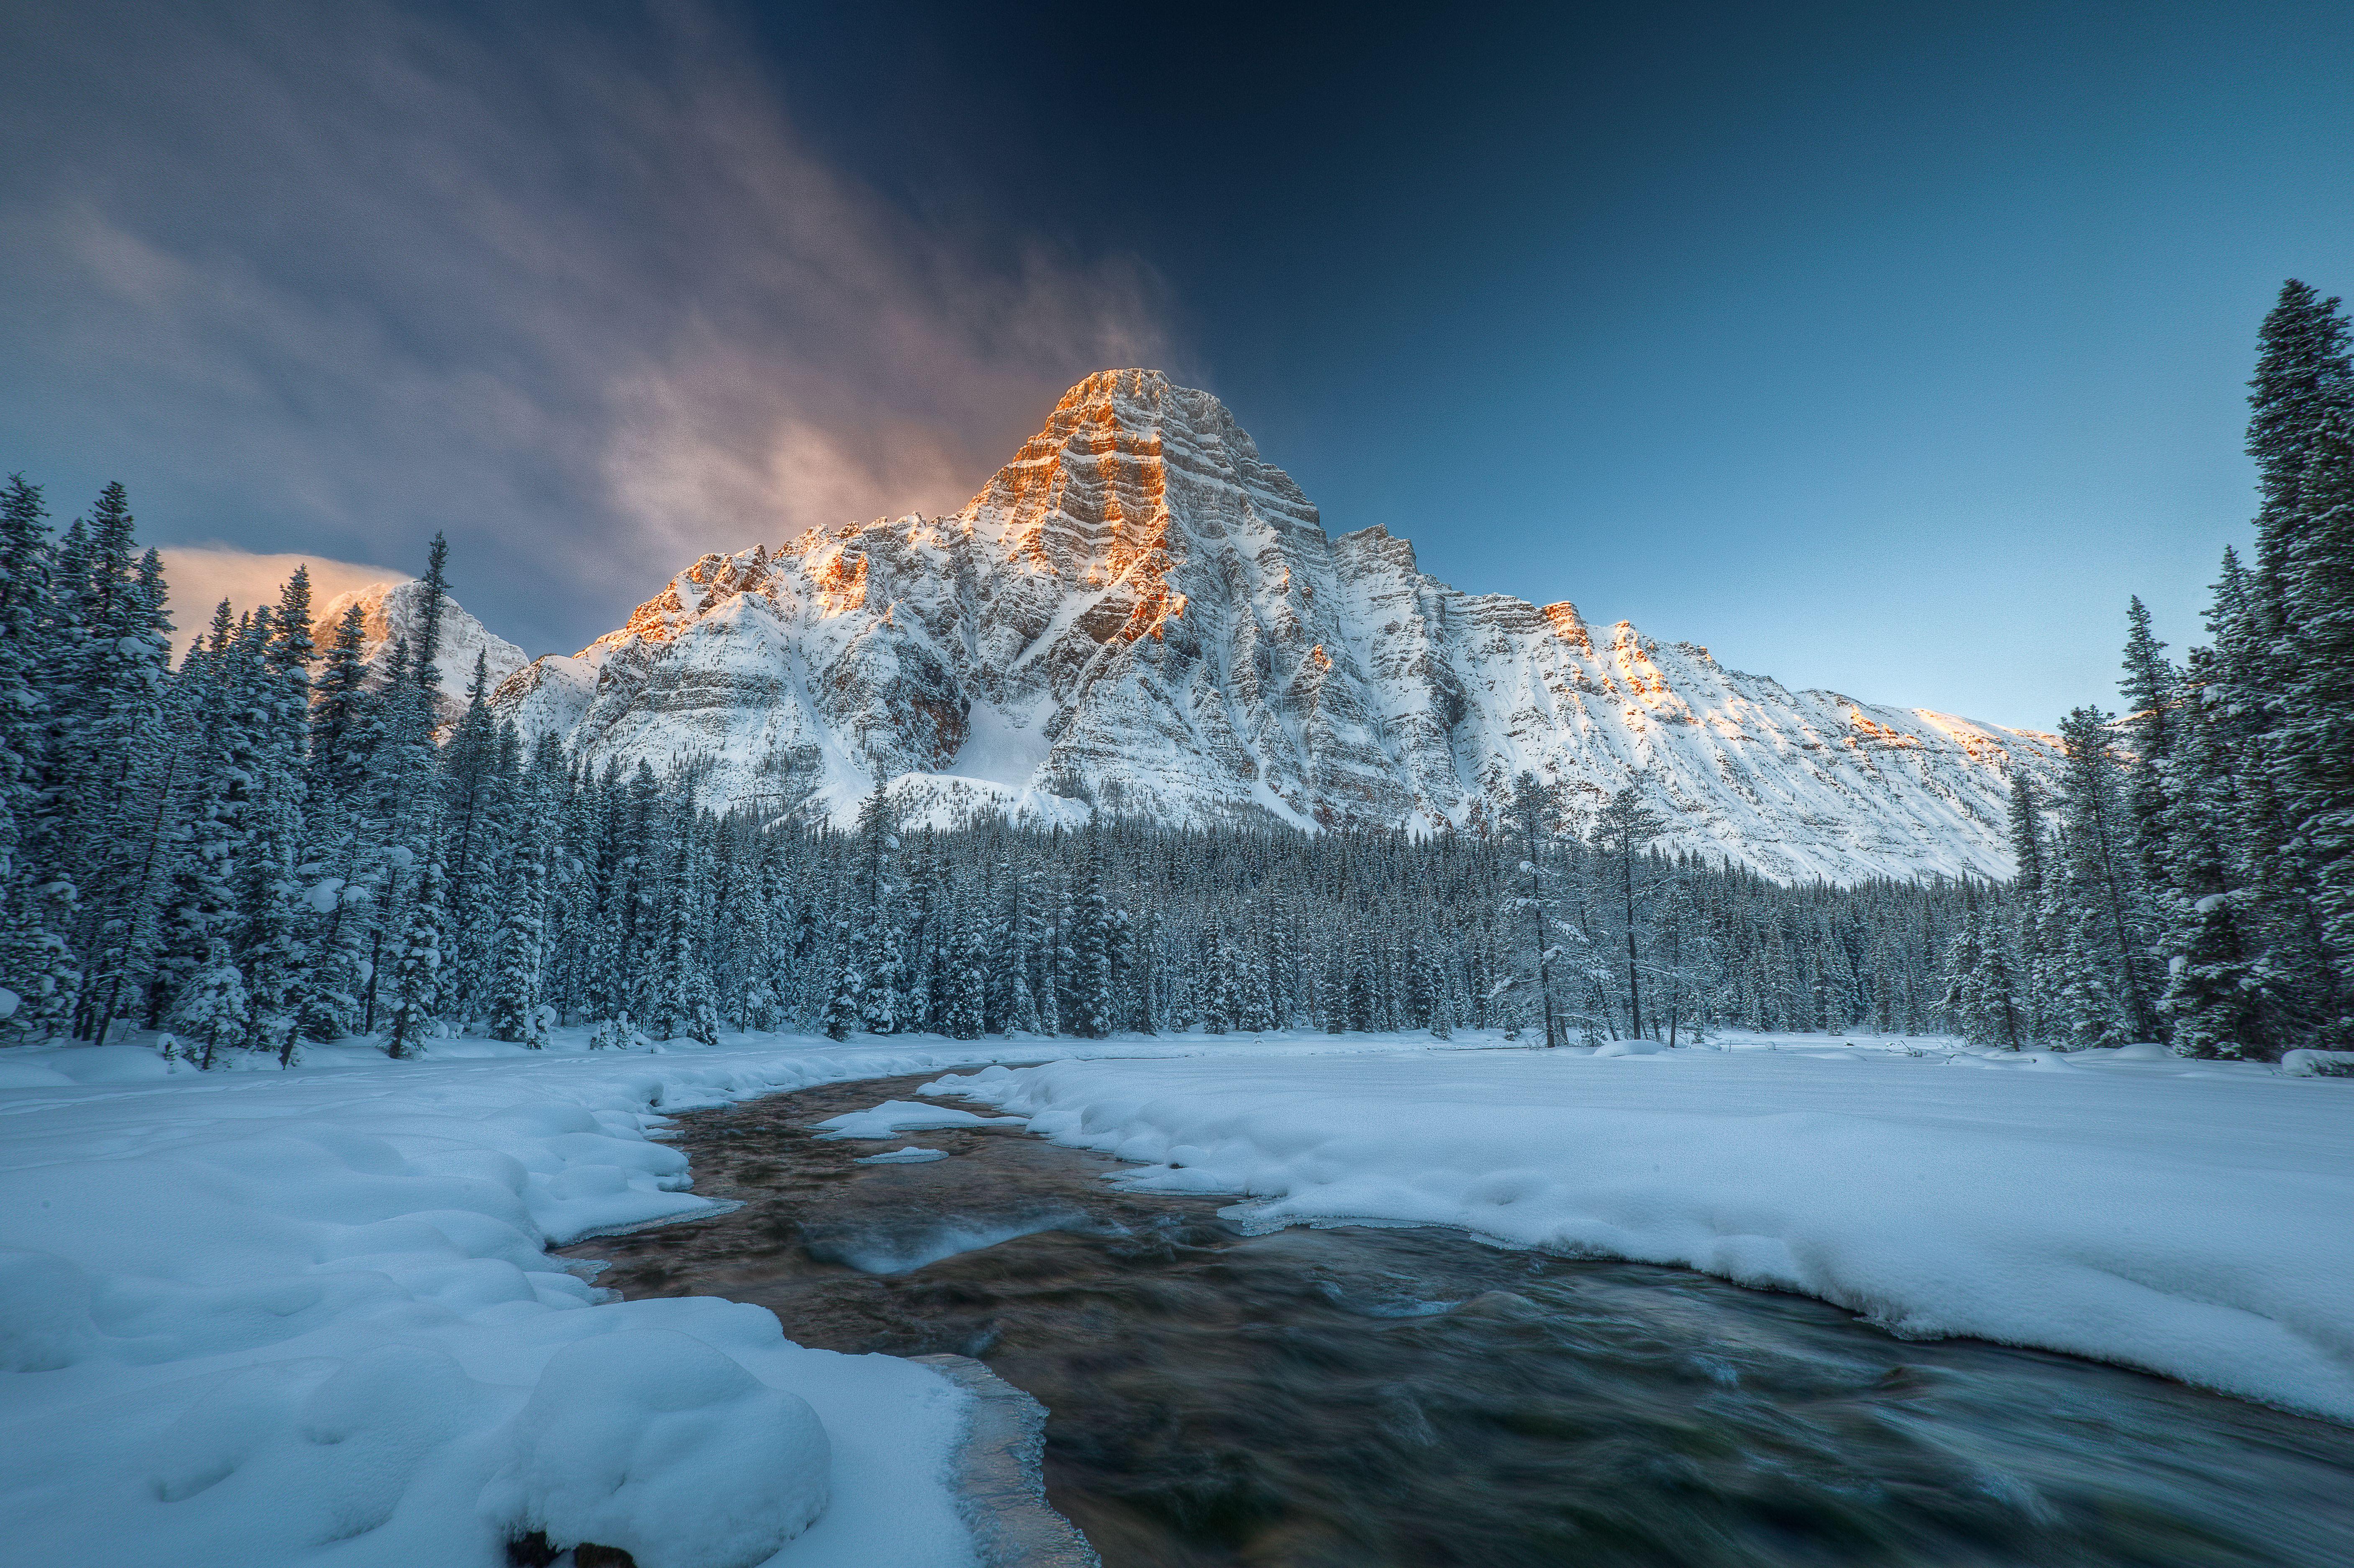 обои Banff National Park, Alberta, Canada, зима картинки фото